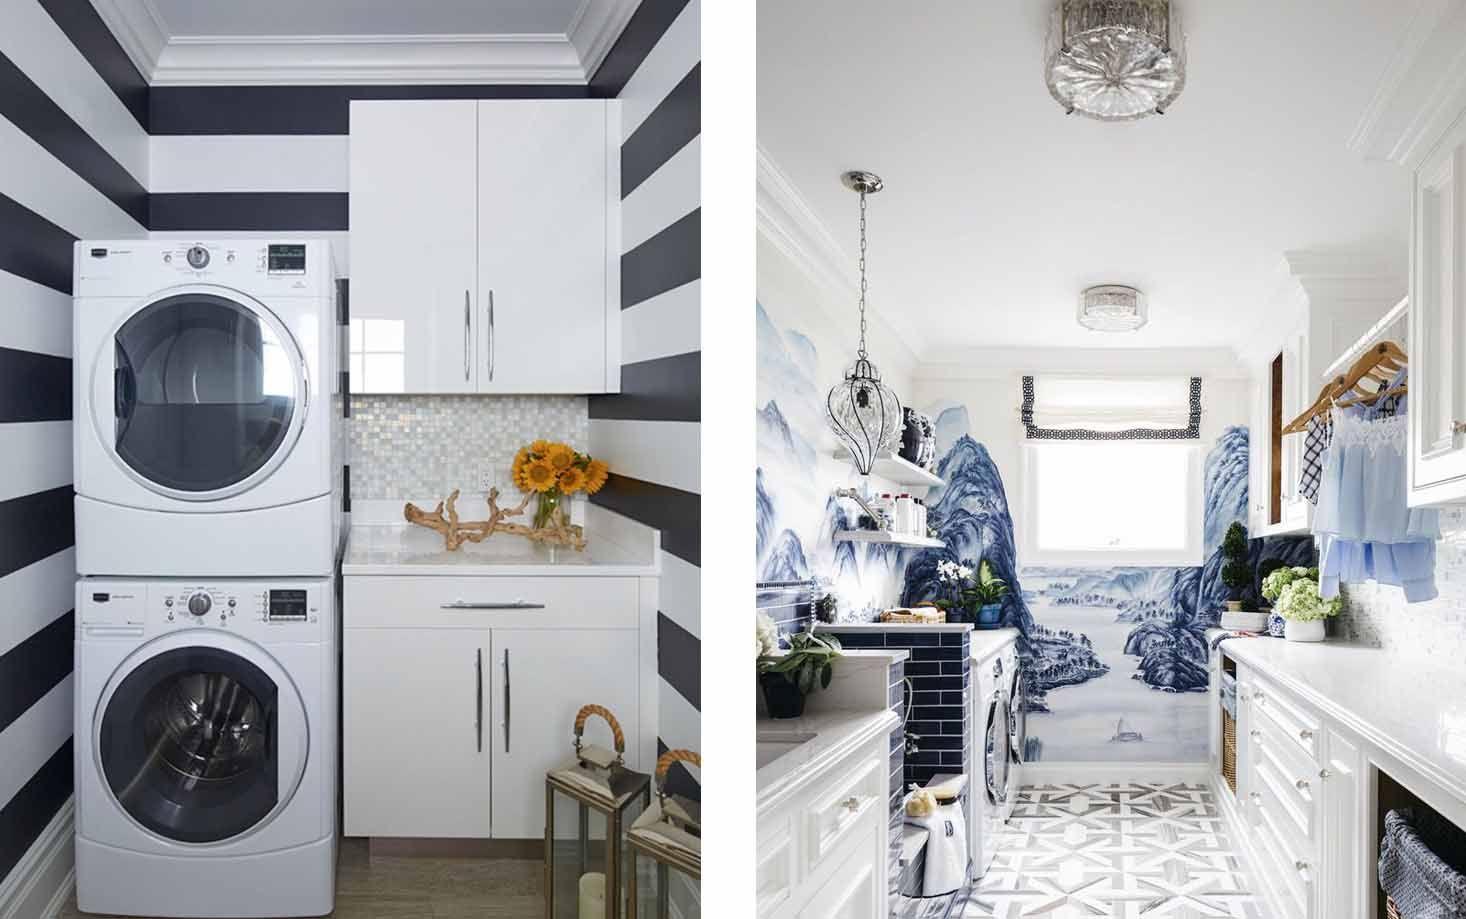 15 Beautiful Small Laundry Room Ideas Best Laundry Room